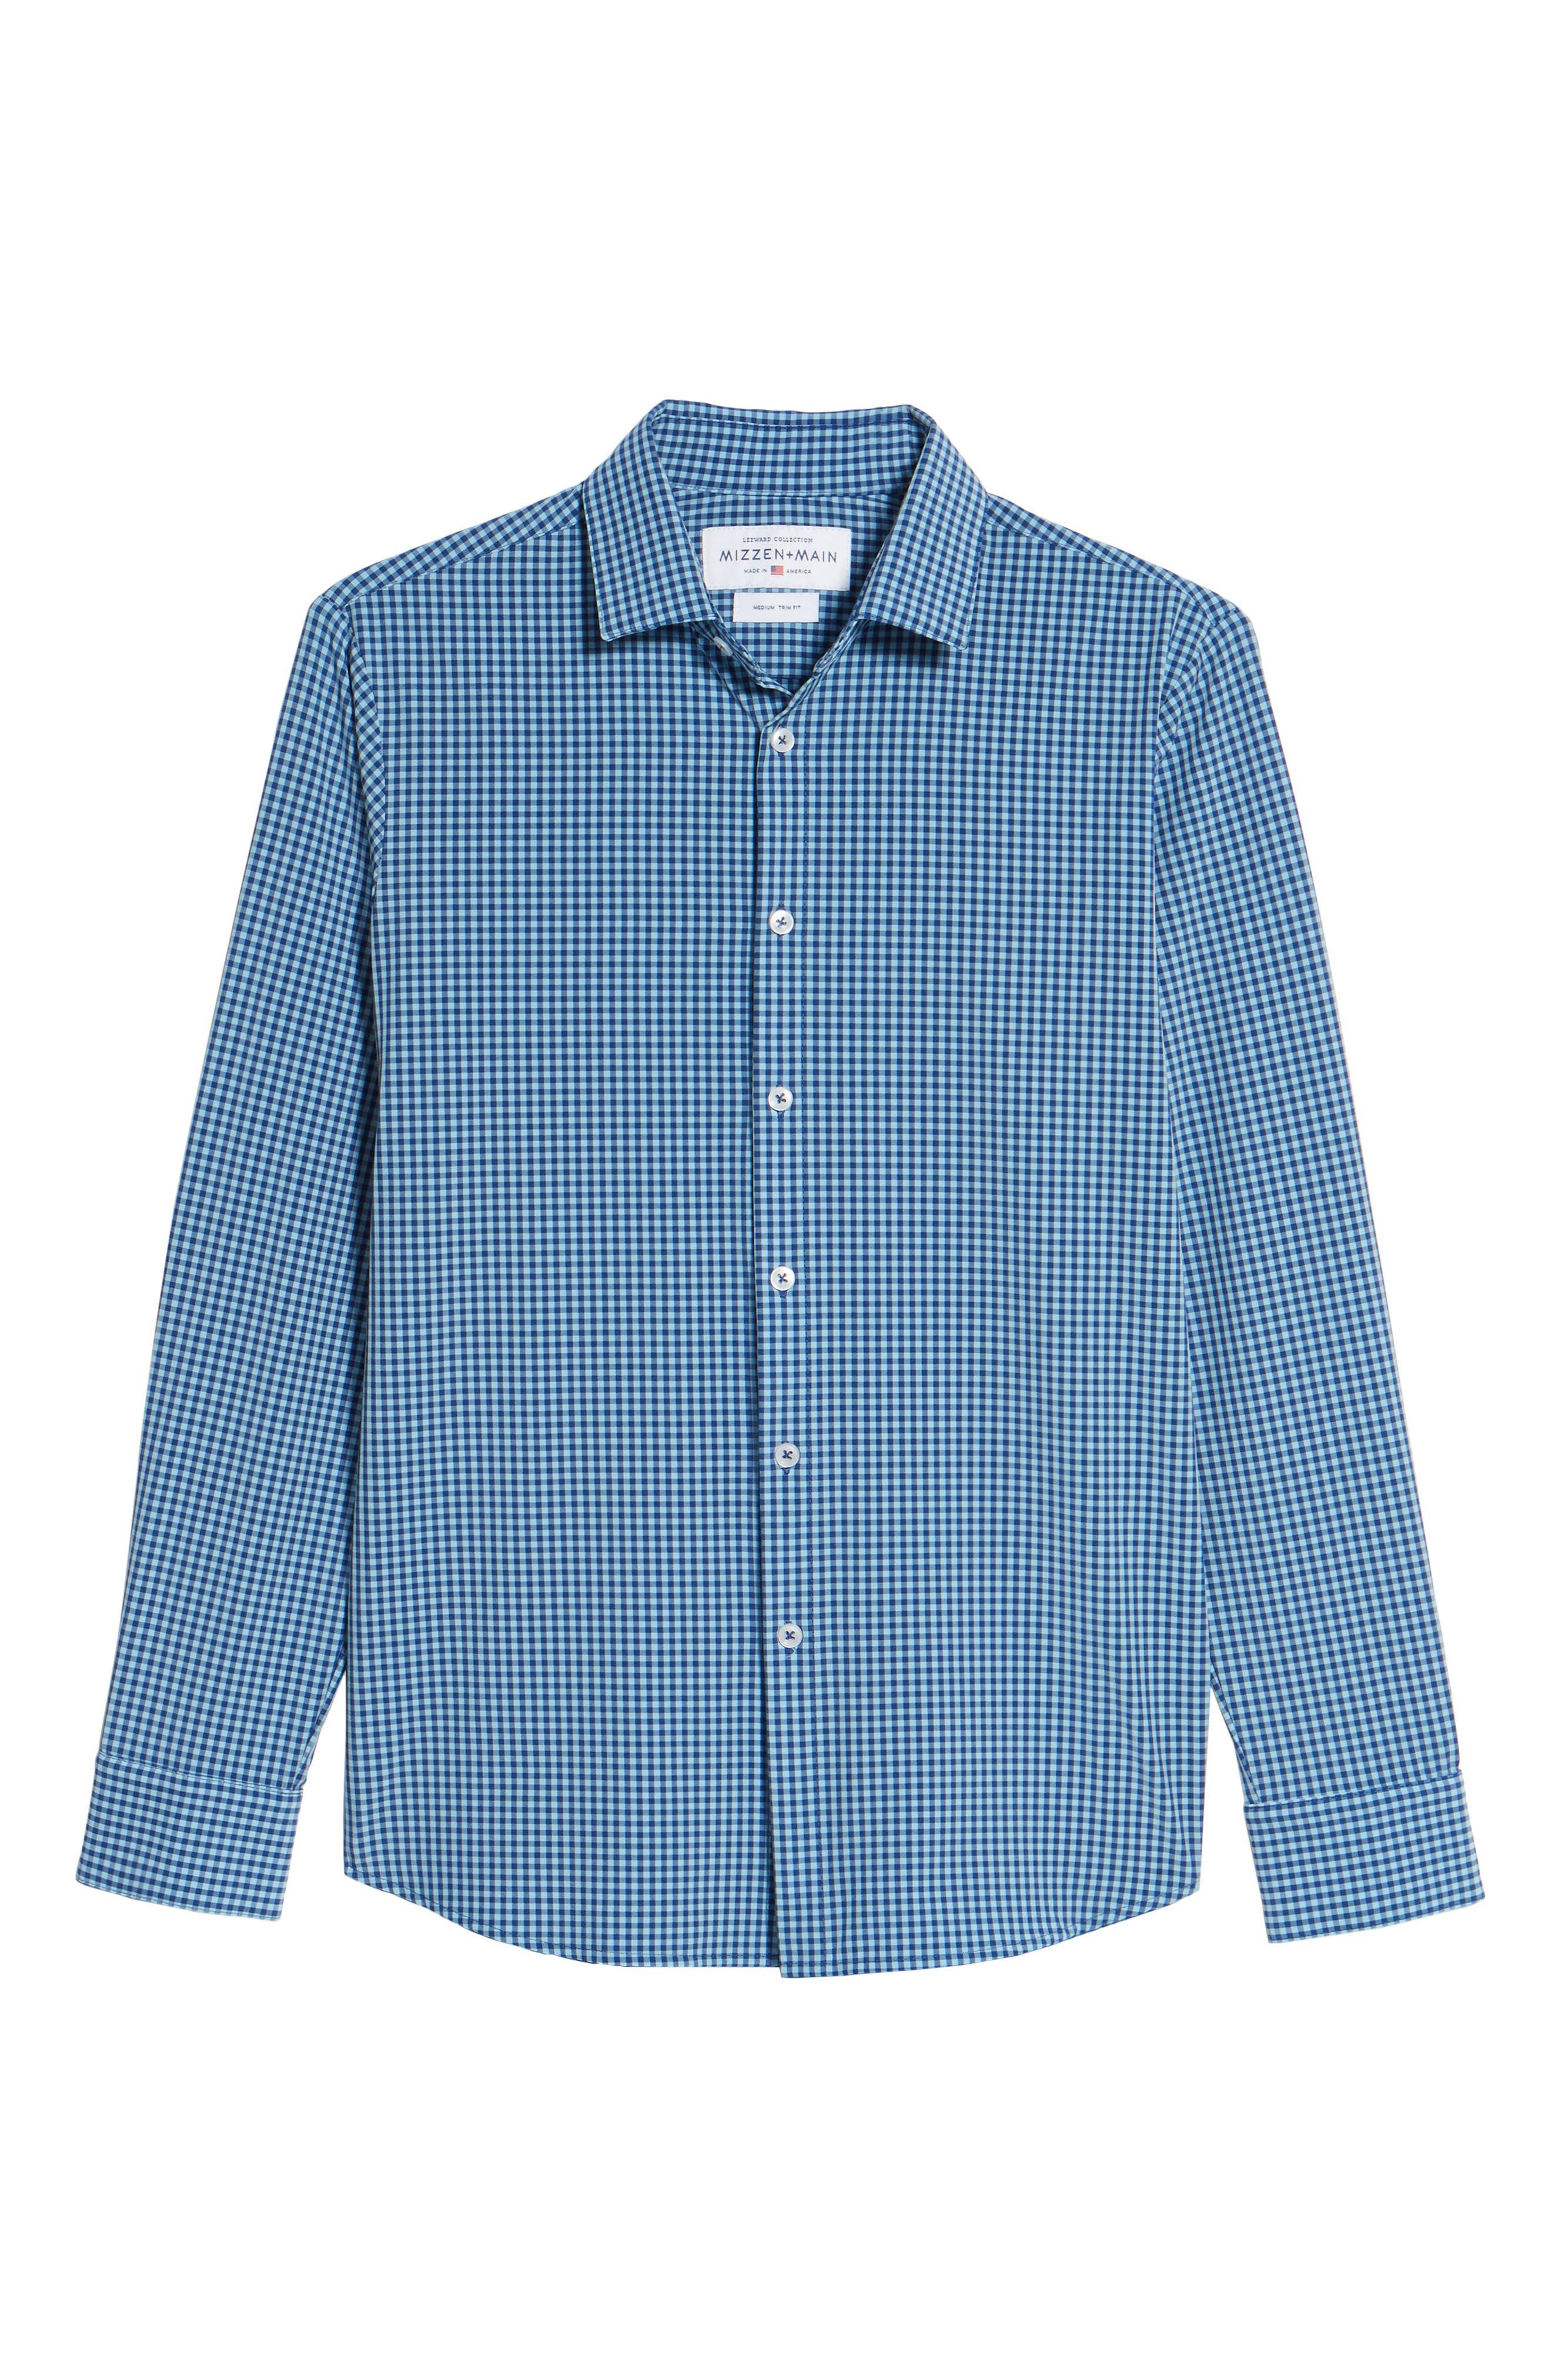 Brighton Blue Check Sport Shirt,                             Alternate thumbnail 6, color,                             Blue